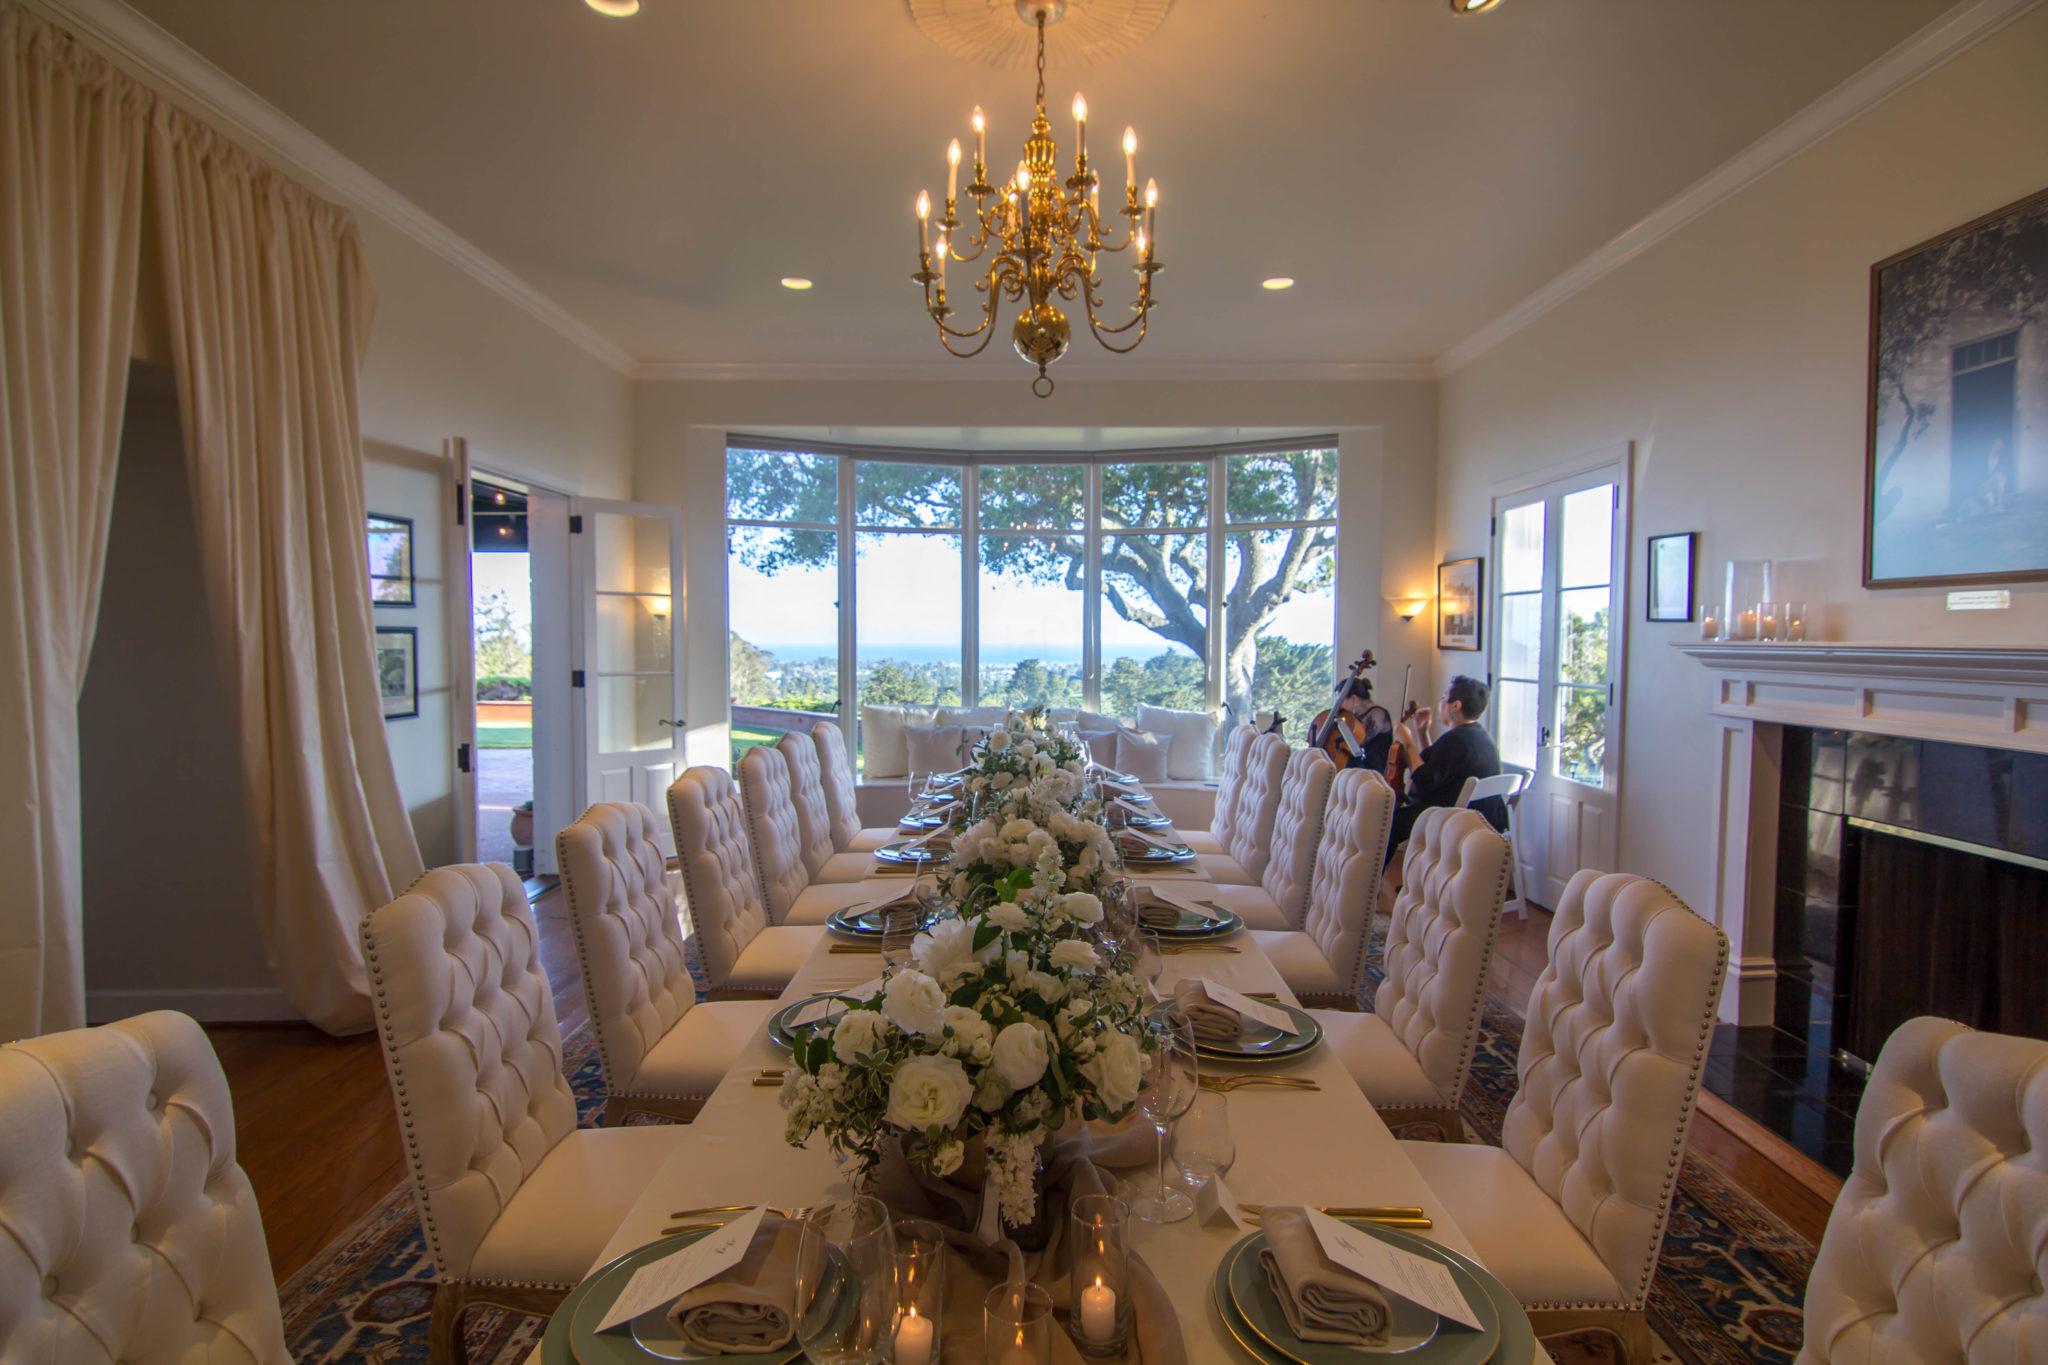 Hollins Room Banquet